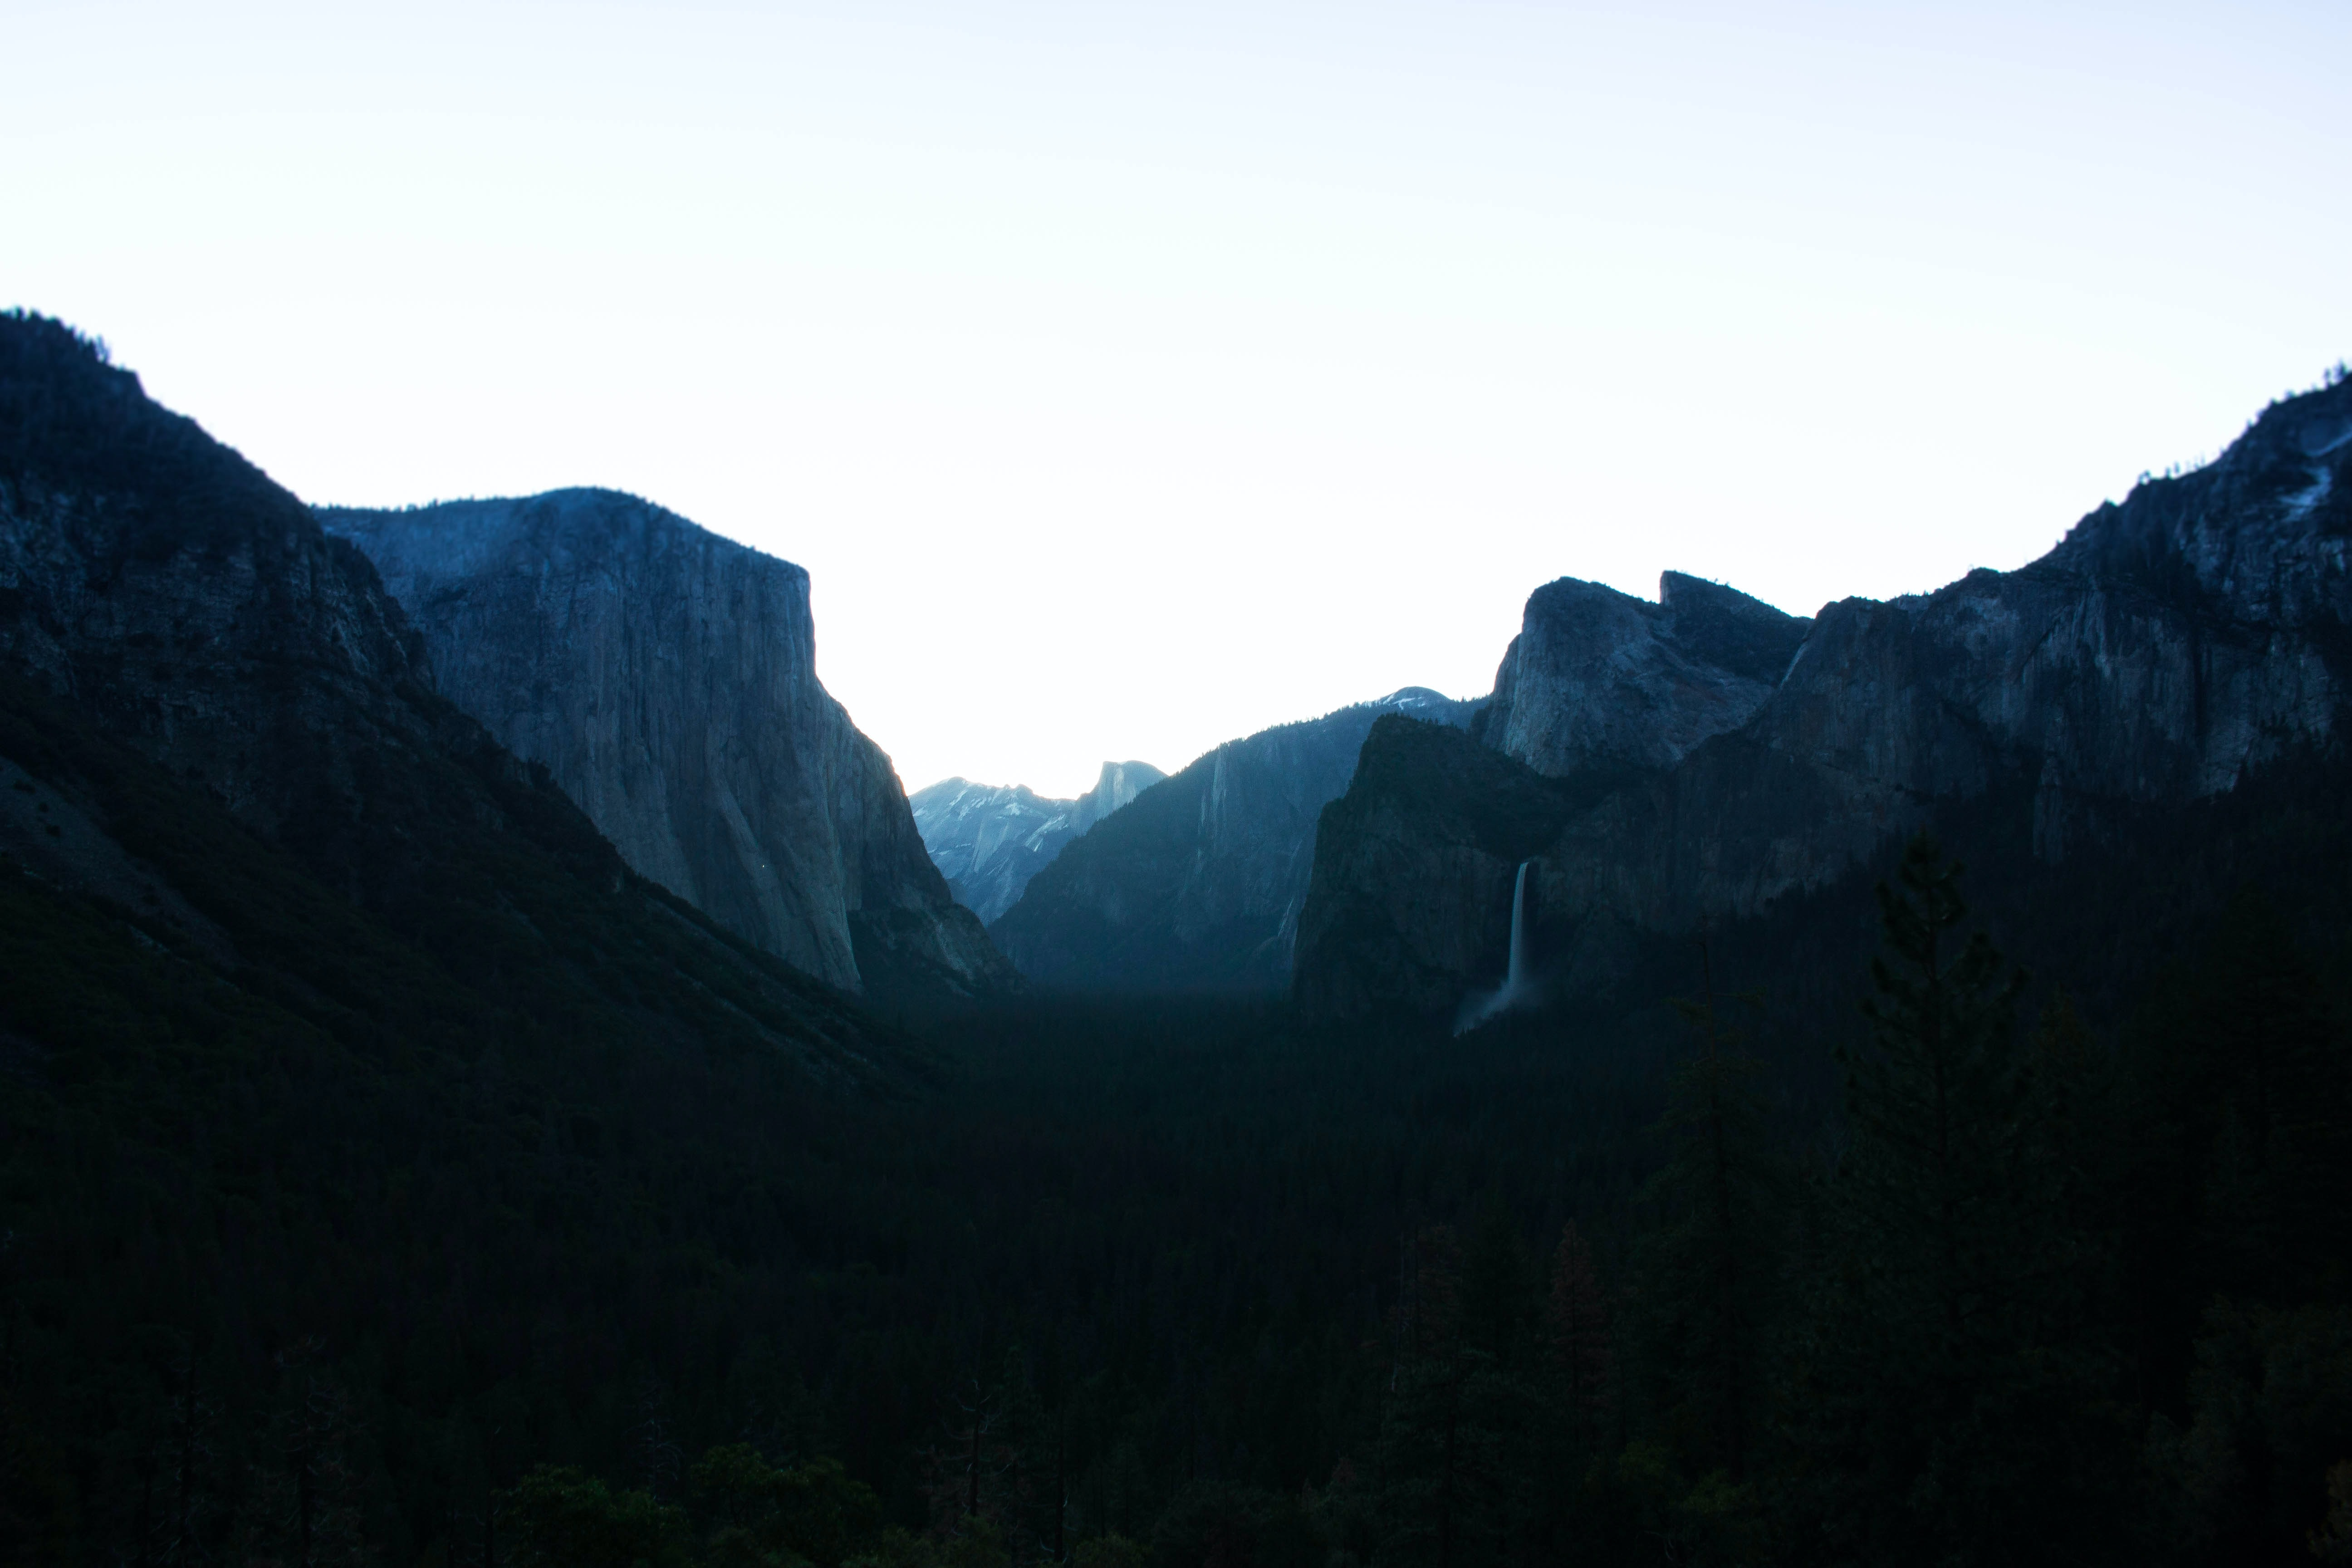 silhouette photo of mountain alps